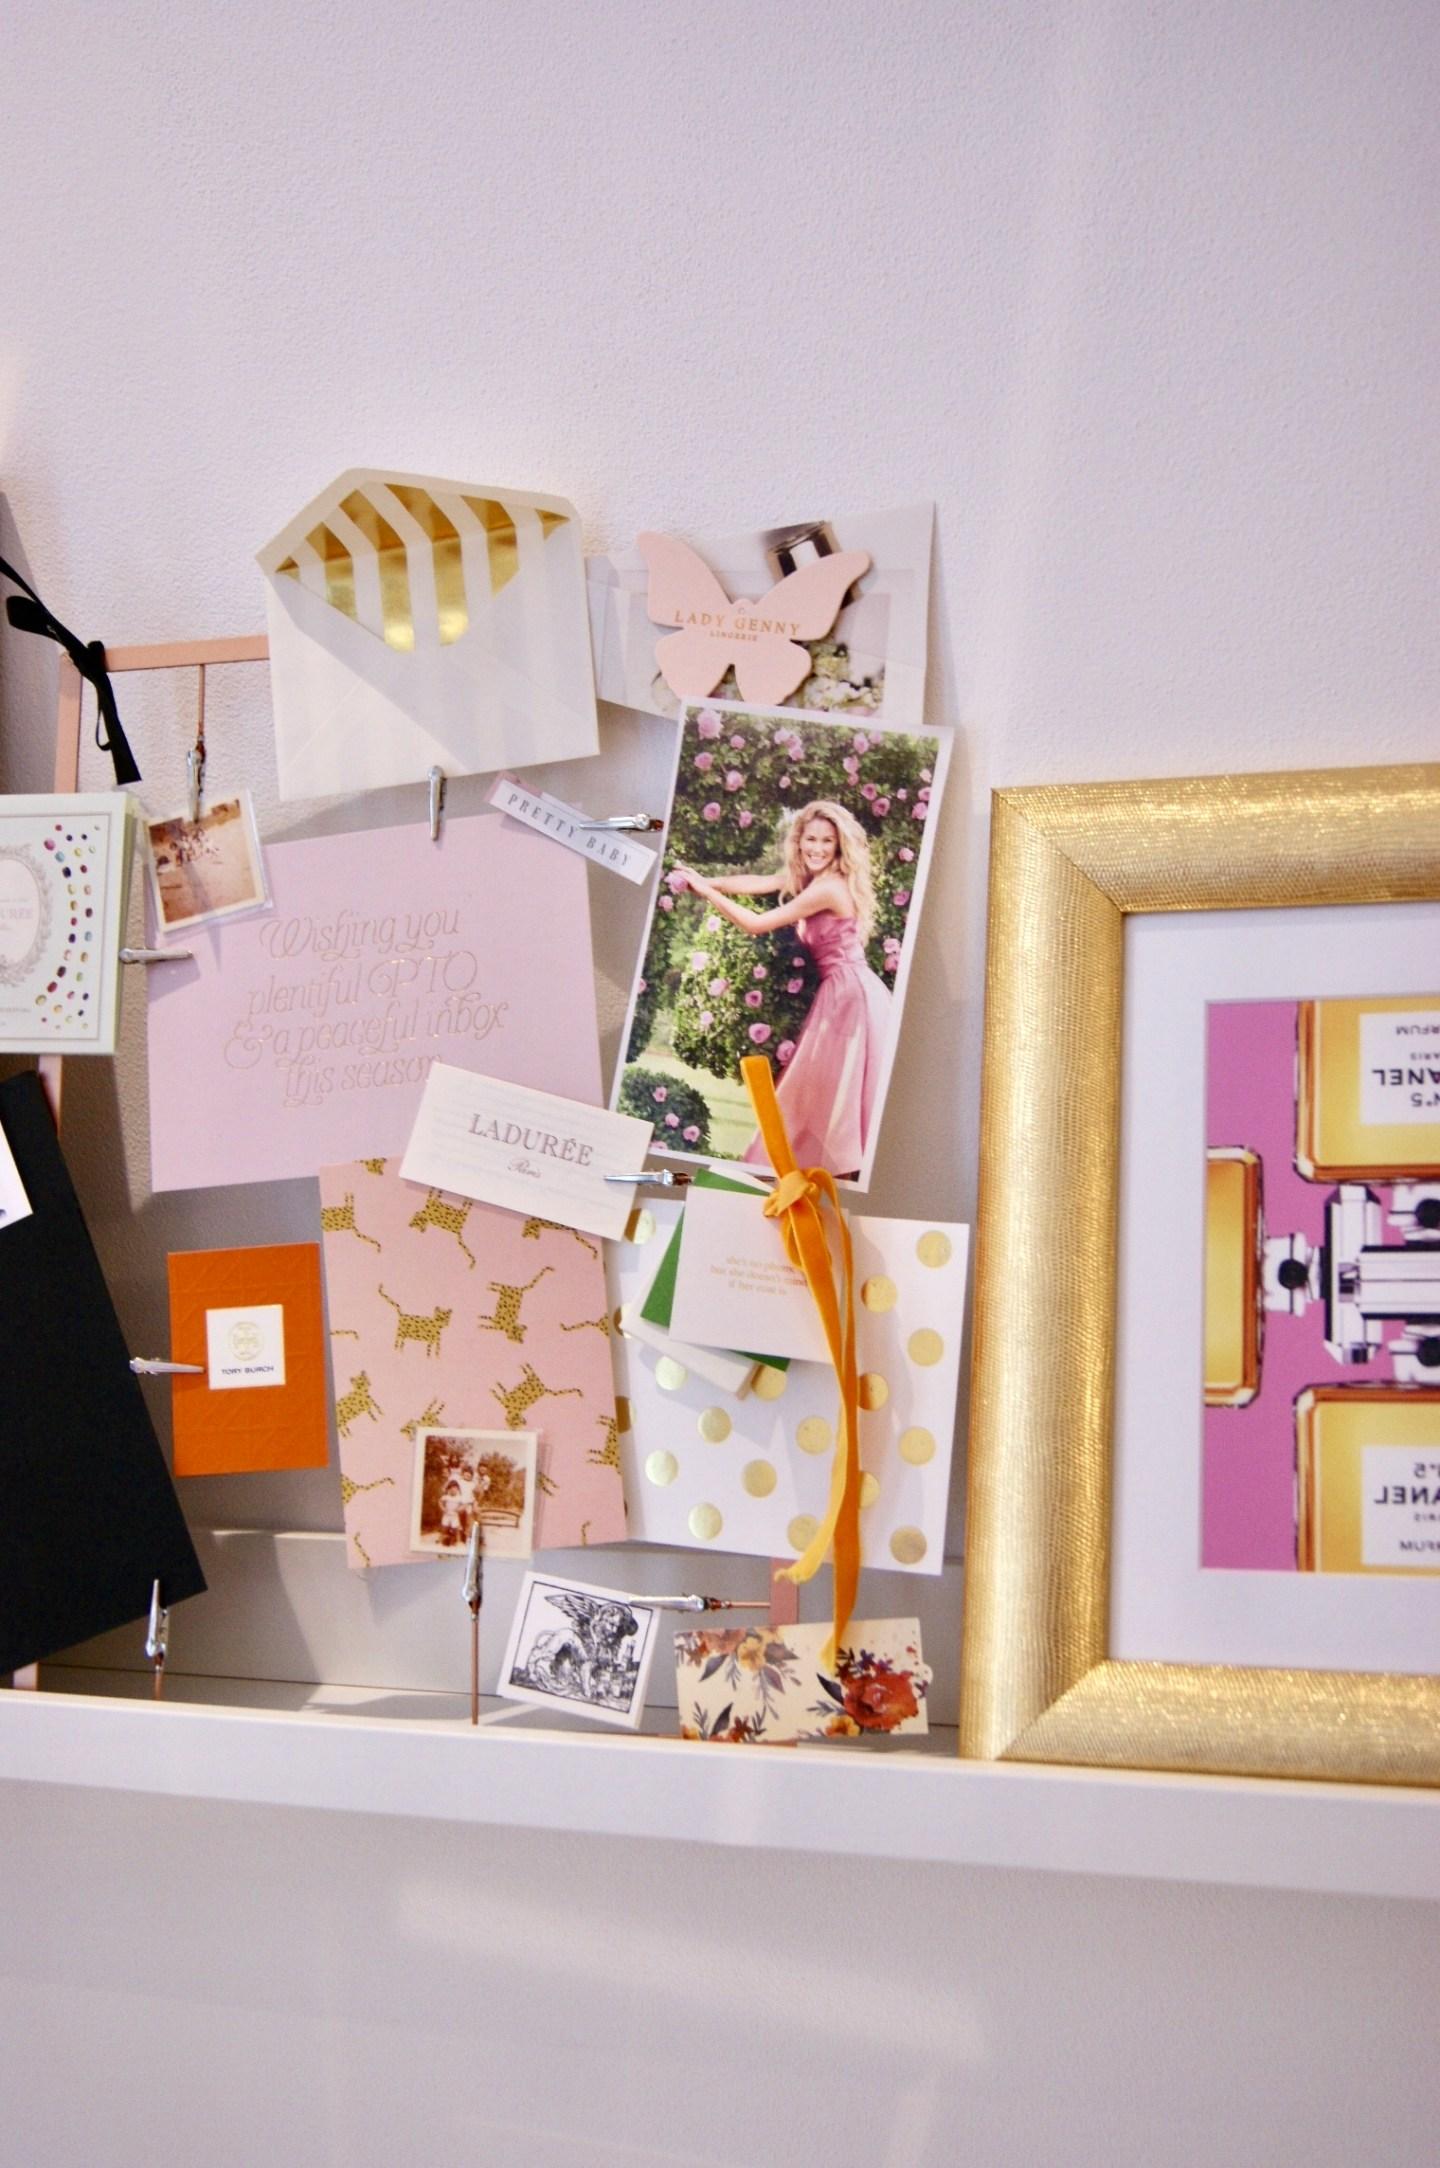 Creating an inspiration board DIY